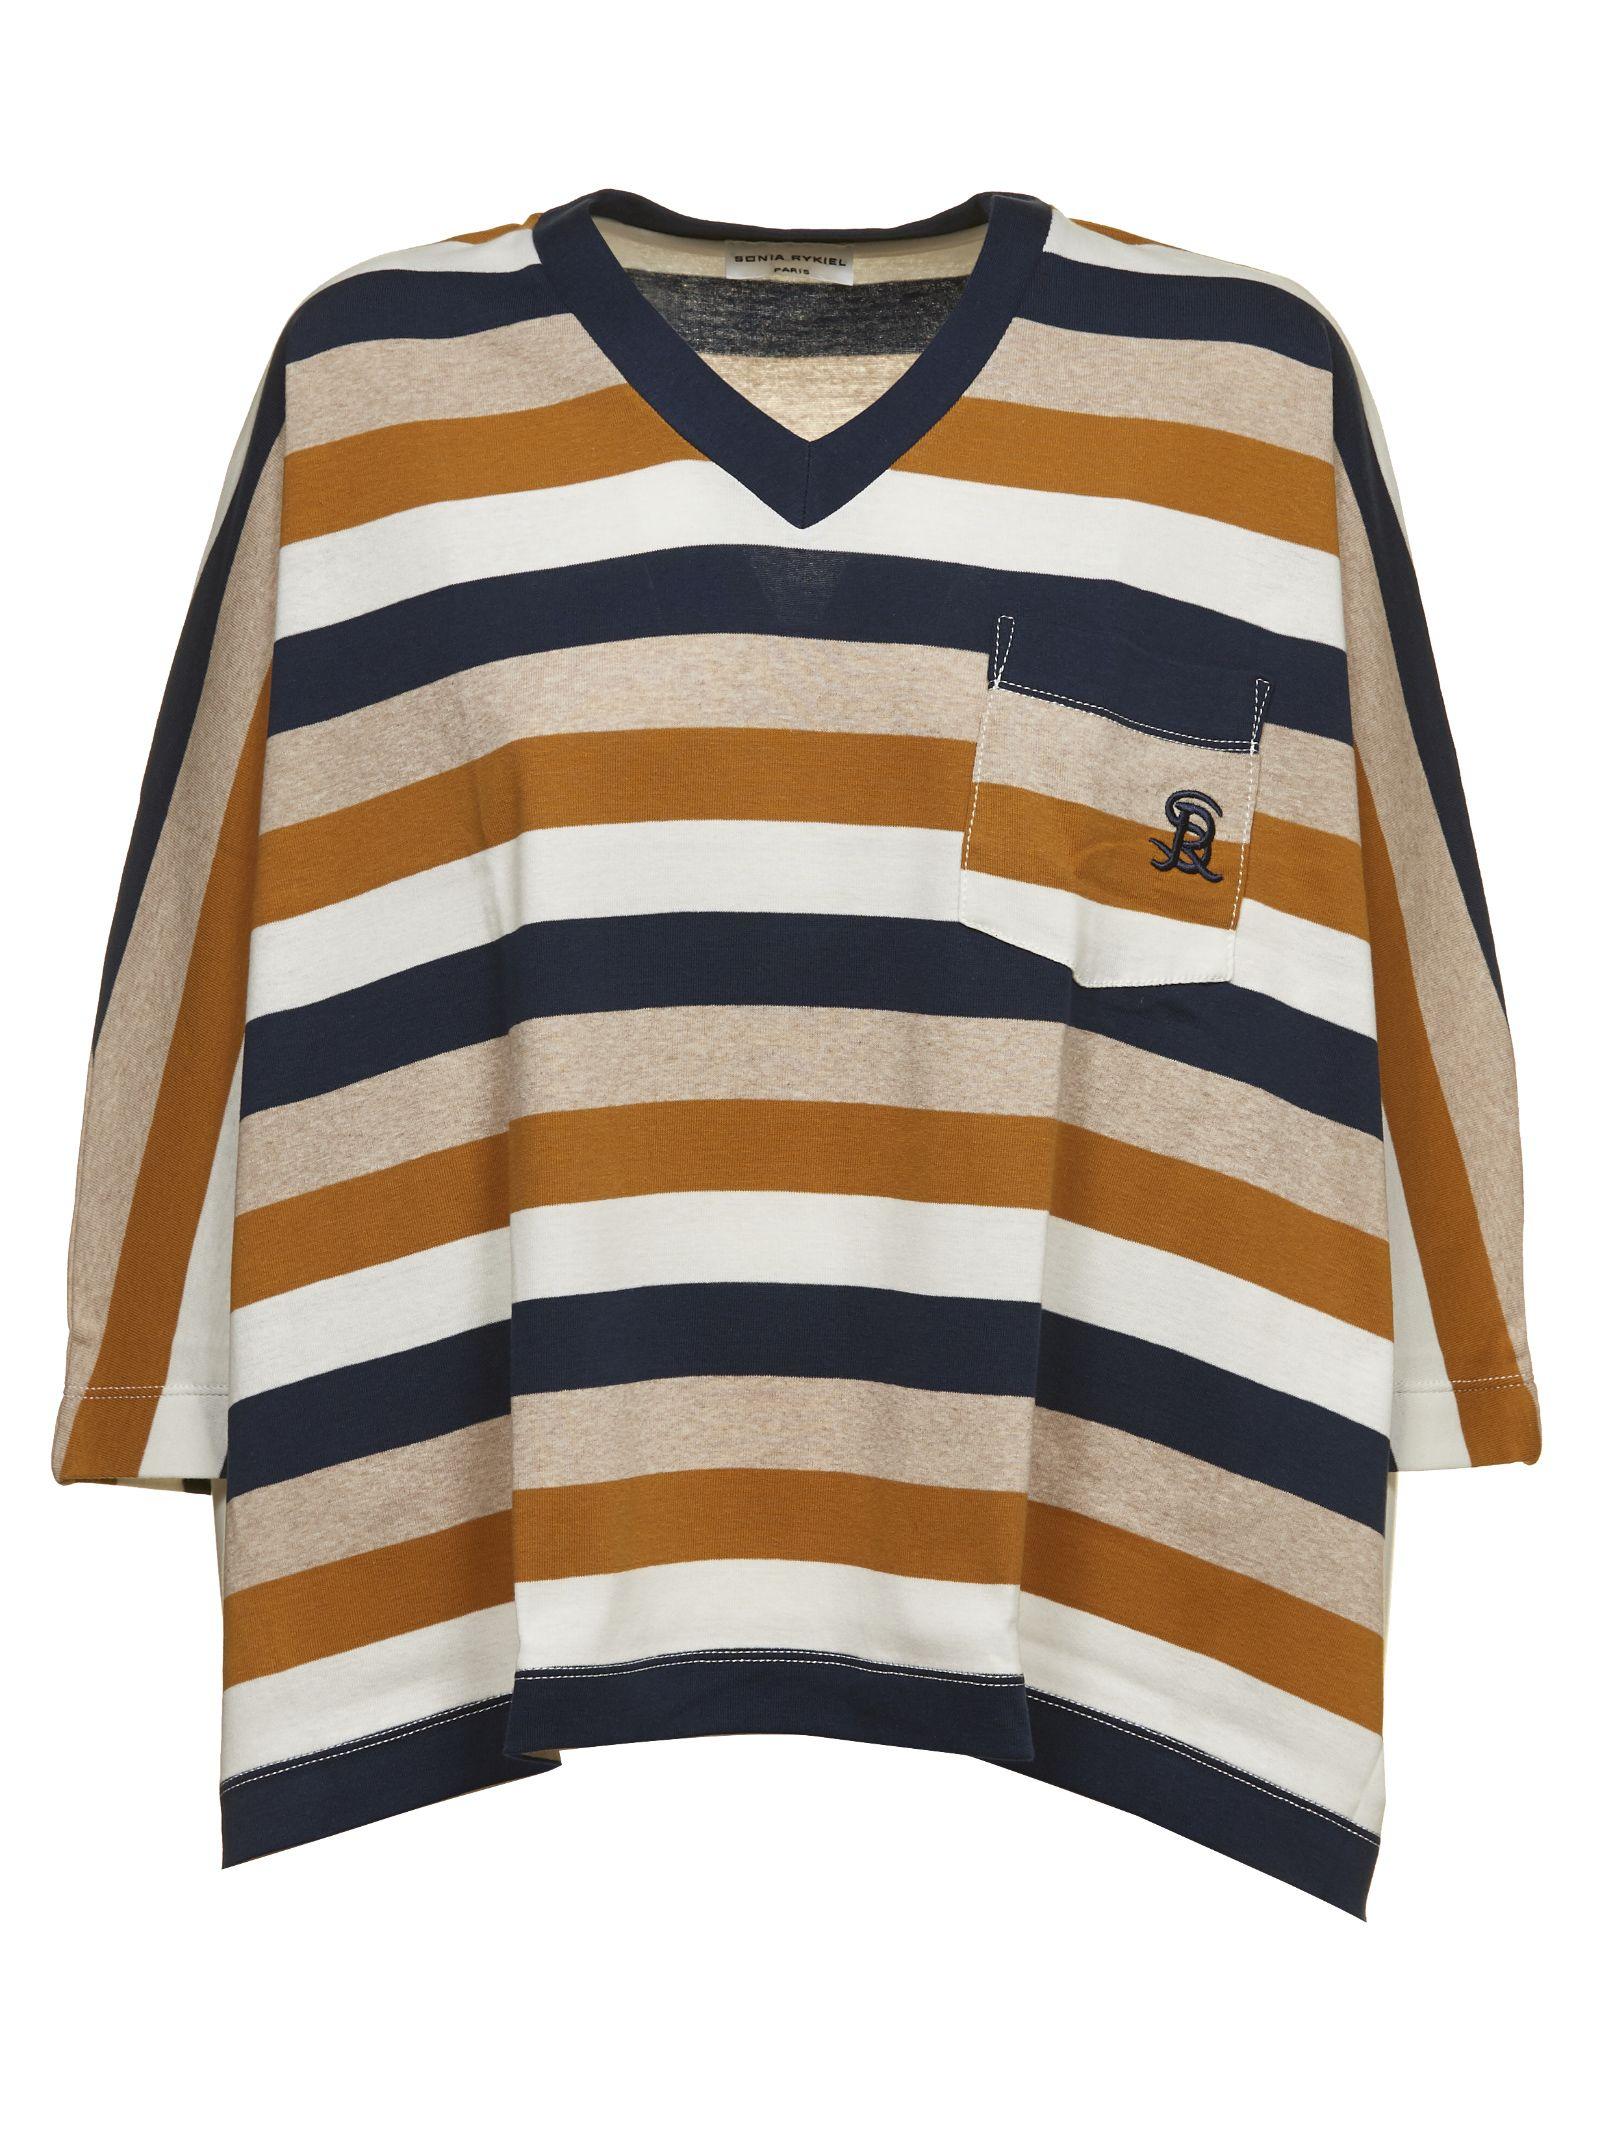 SONIA BY SONIA RYKIEL Sonia By Sonia Rykiel Striped T-Shirt in Multicolor